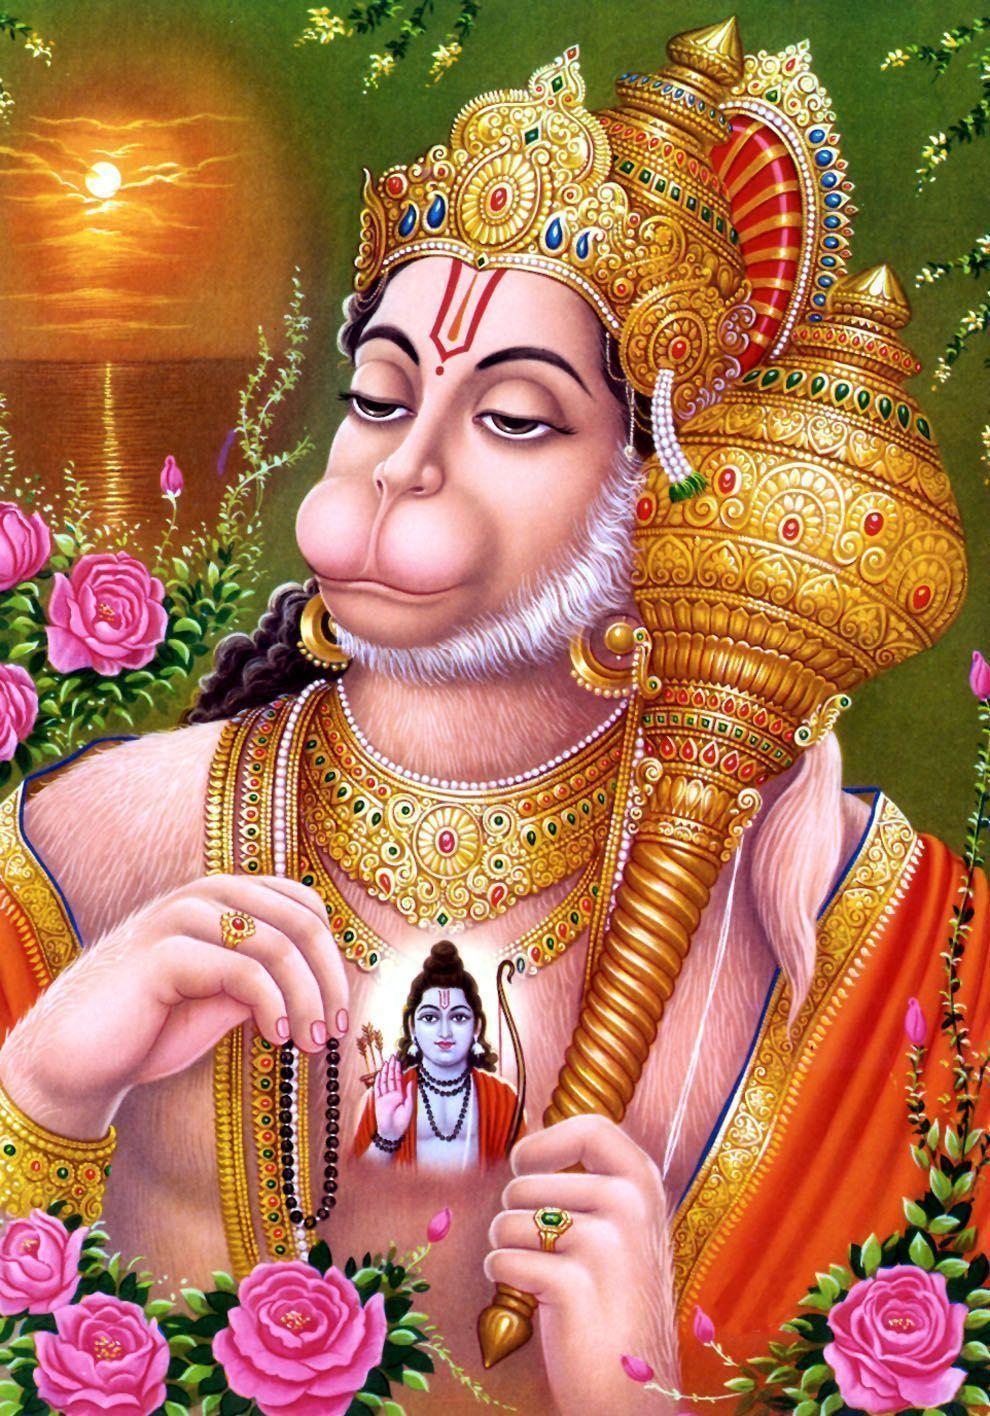 God Hanuman Wallpapers Top Free God Hanuman Backgrounds Wallpaperaccess